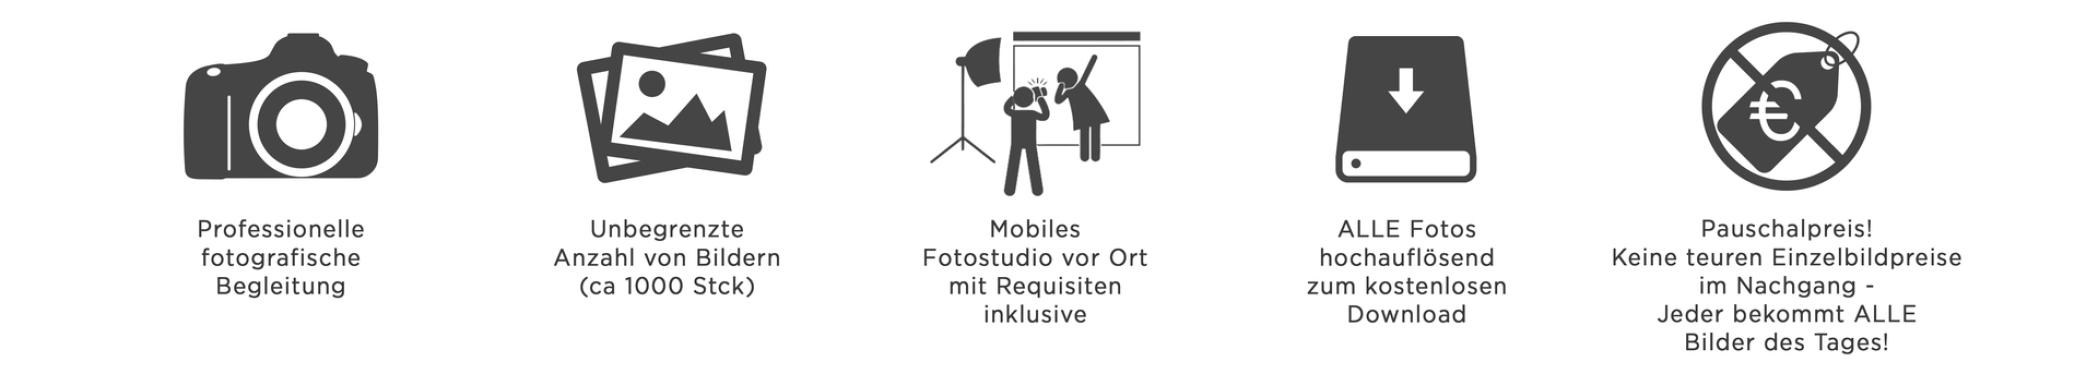 LIGHTREEL Productions - Medienproduktion und Fotografie in Augsburg, Abiball, Studiofotografie, mobiles Studio, Photo Booth, Porträts, Abifotos, Abschlussball, Fotos, Fotografie, Bilder, Fotograf, günstig